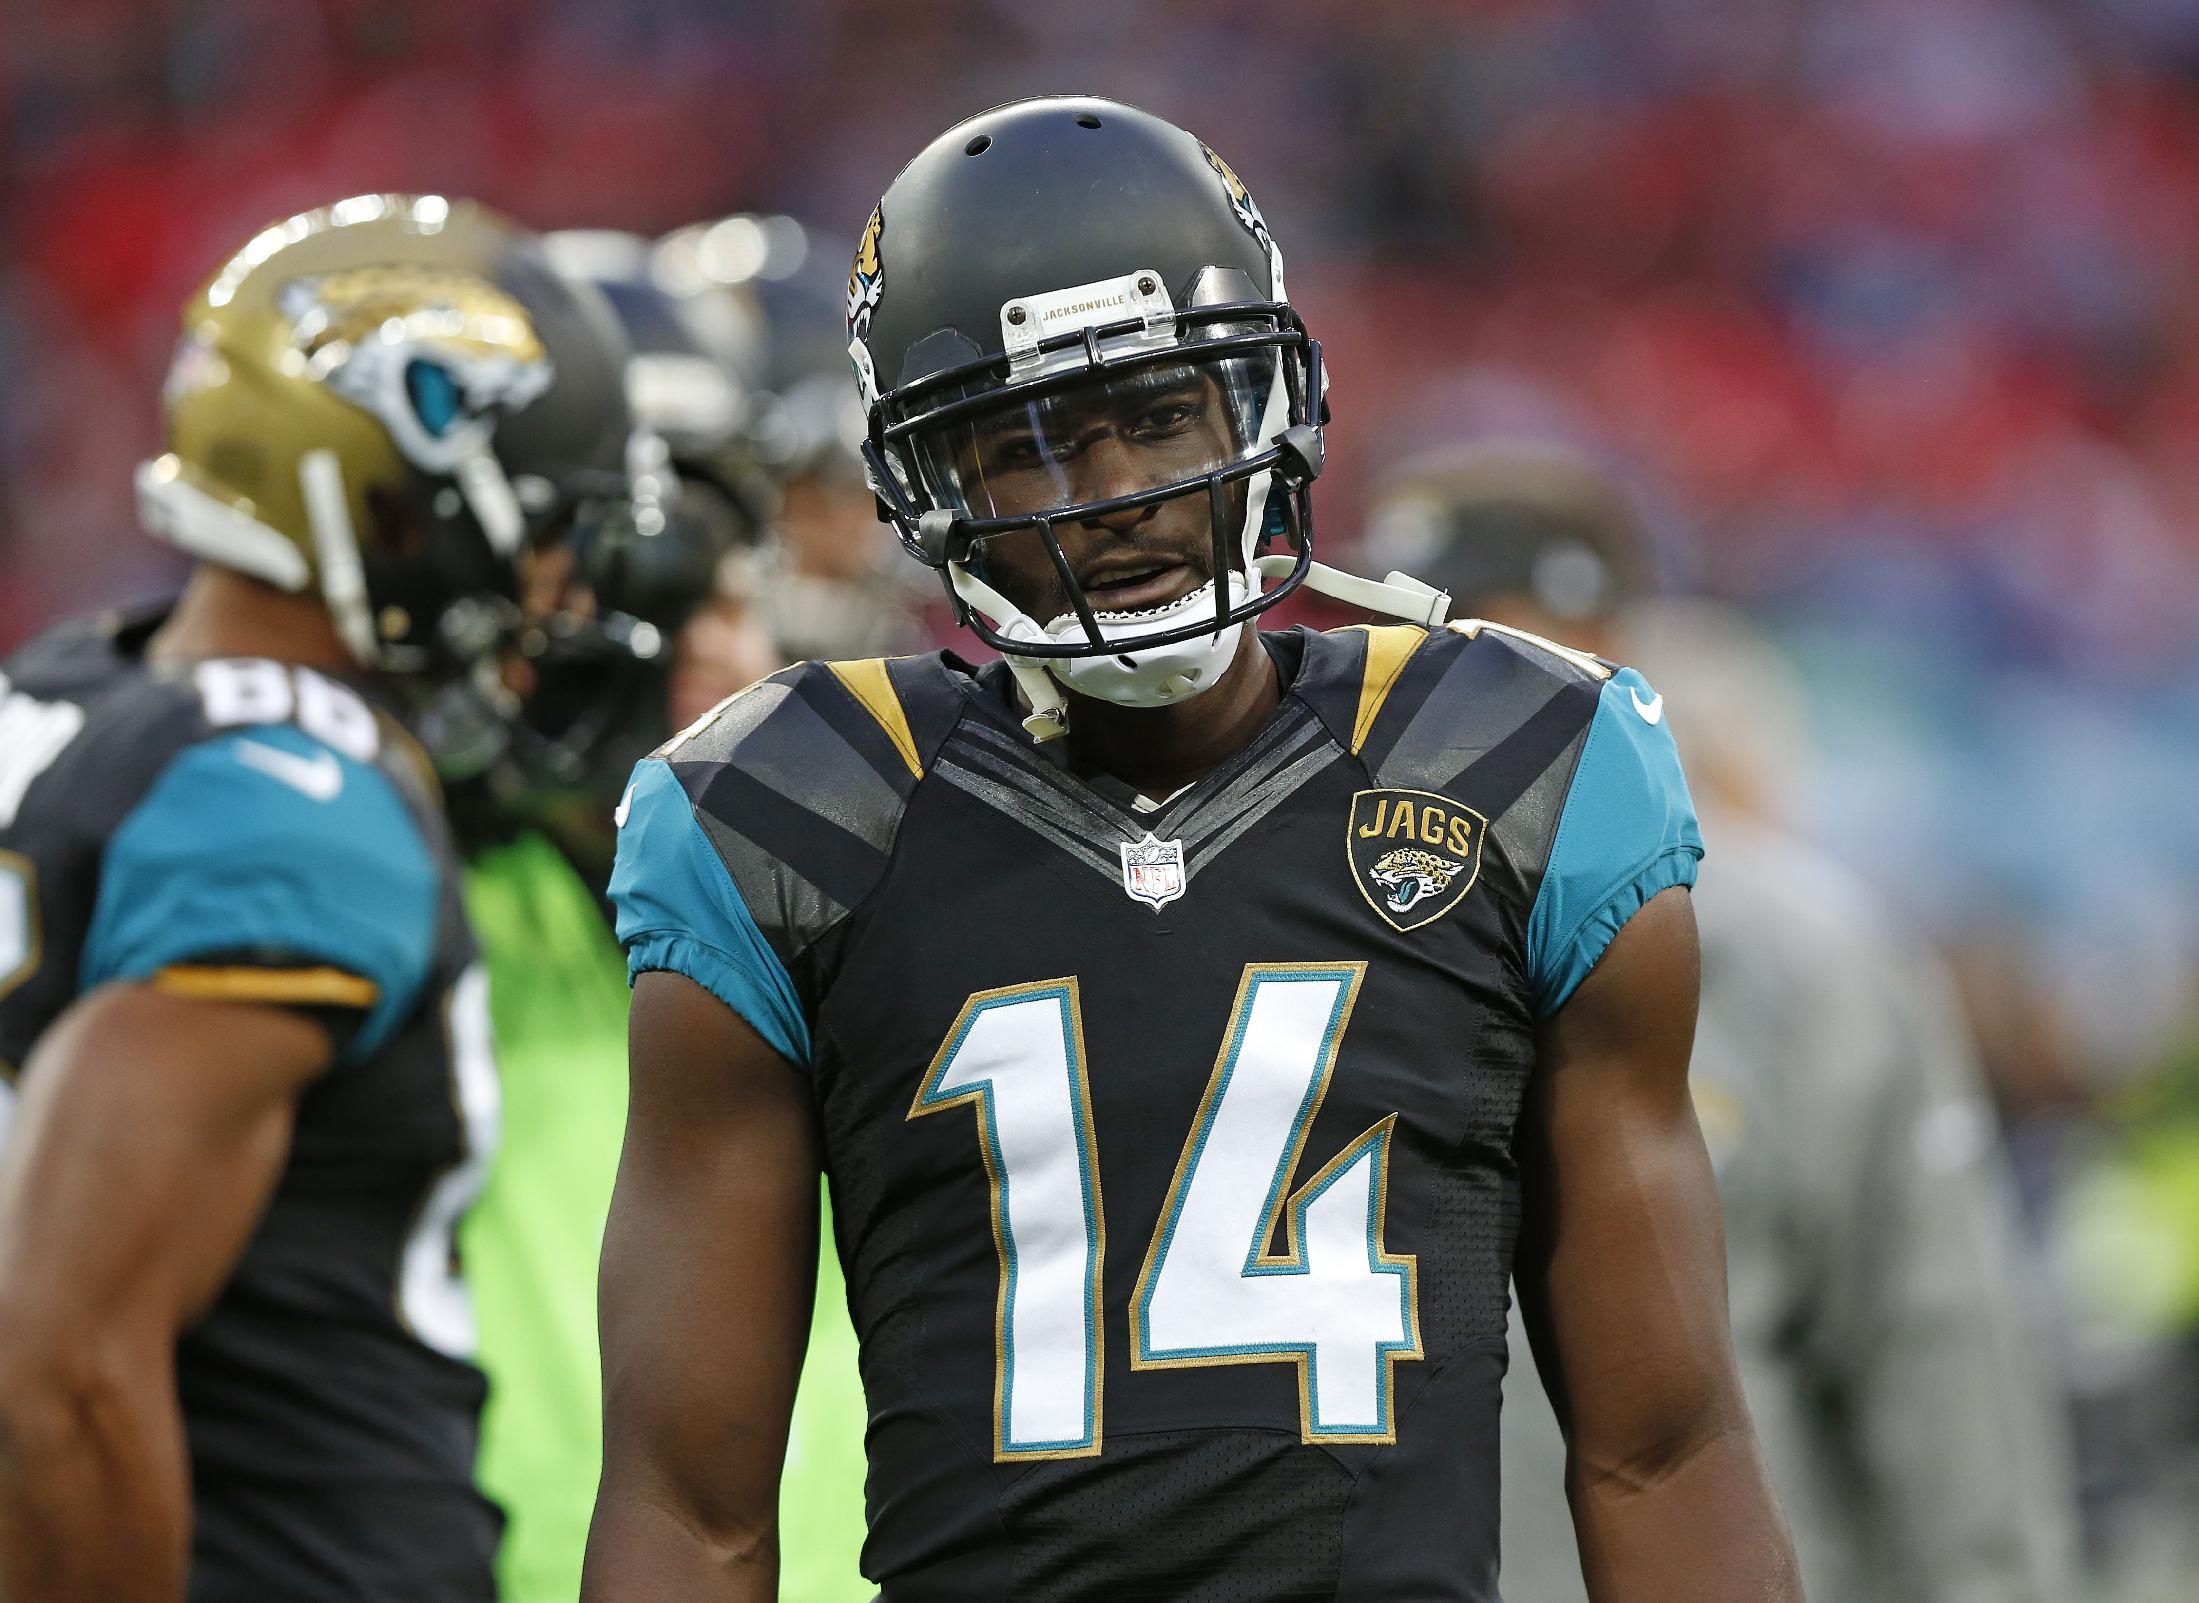 Jaguars WR Blackmon suspended indefinitely